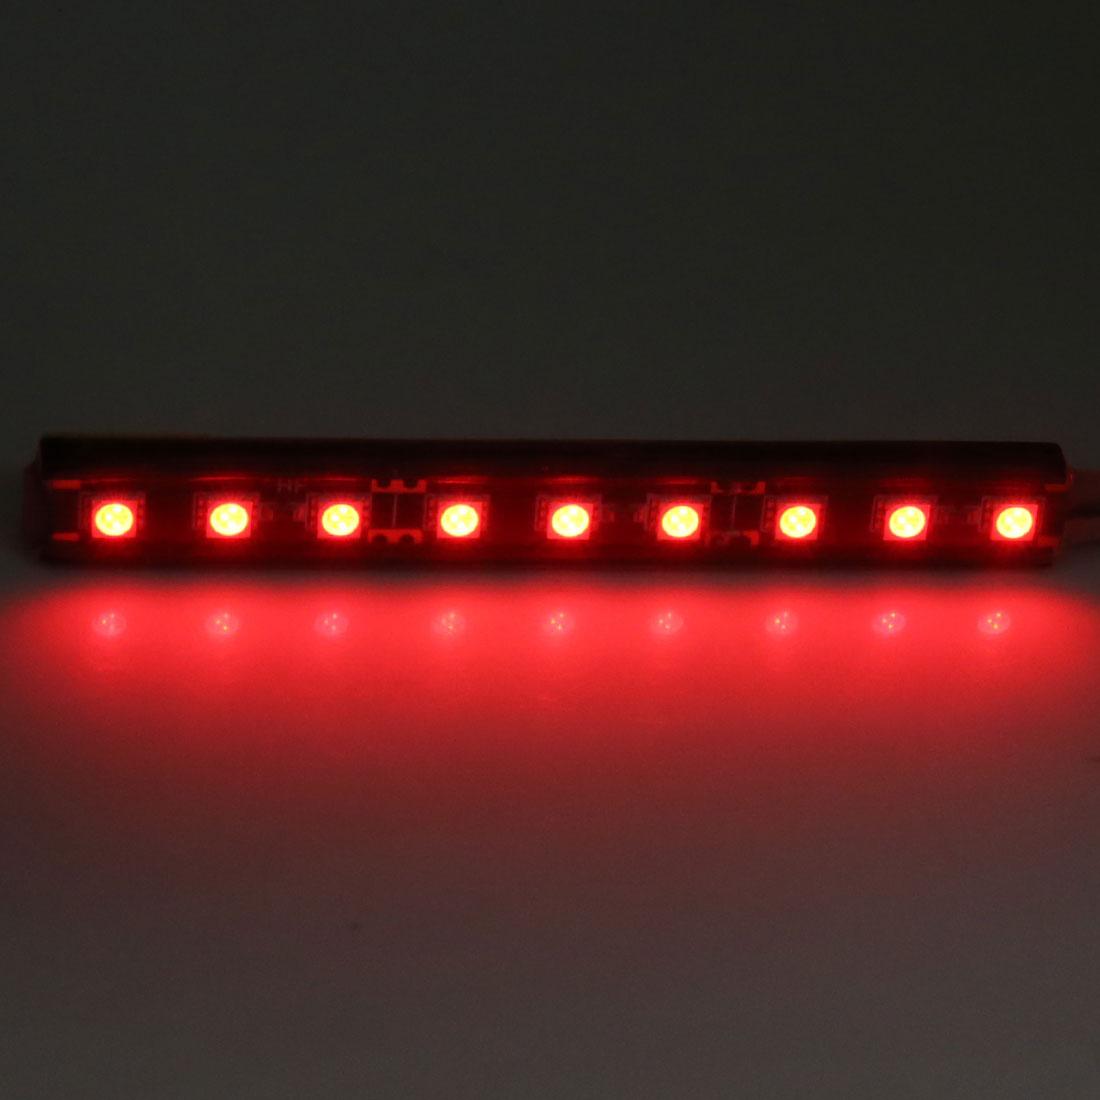 2pcs 9 Red Lights Car Atmosphere Floor Lamp Strip Kit Interior